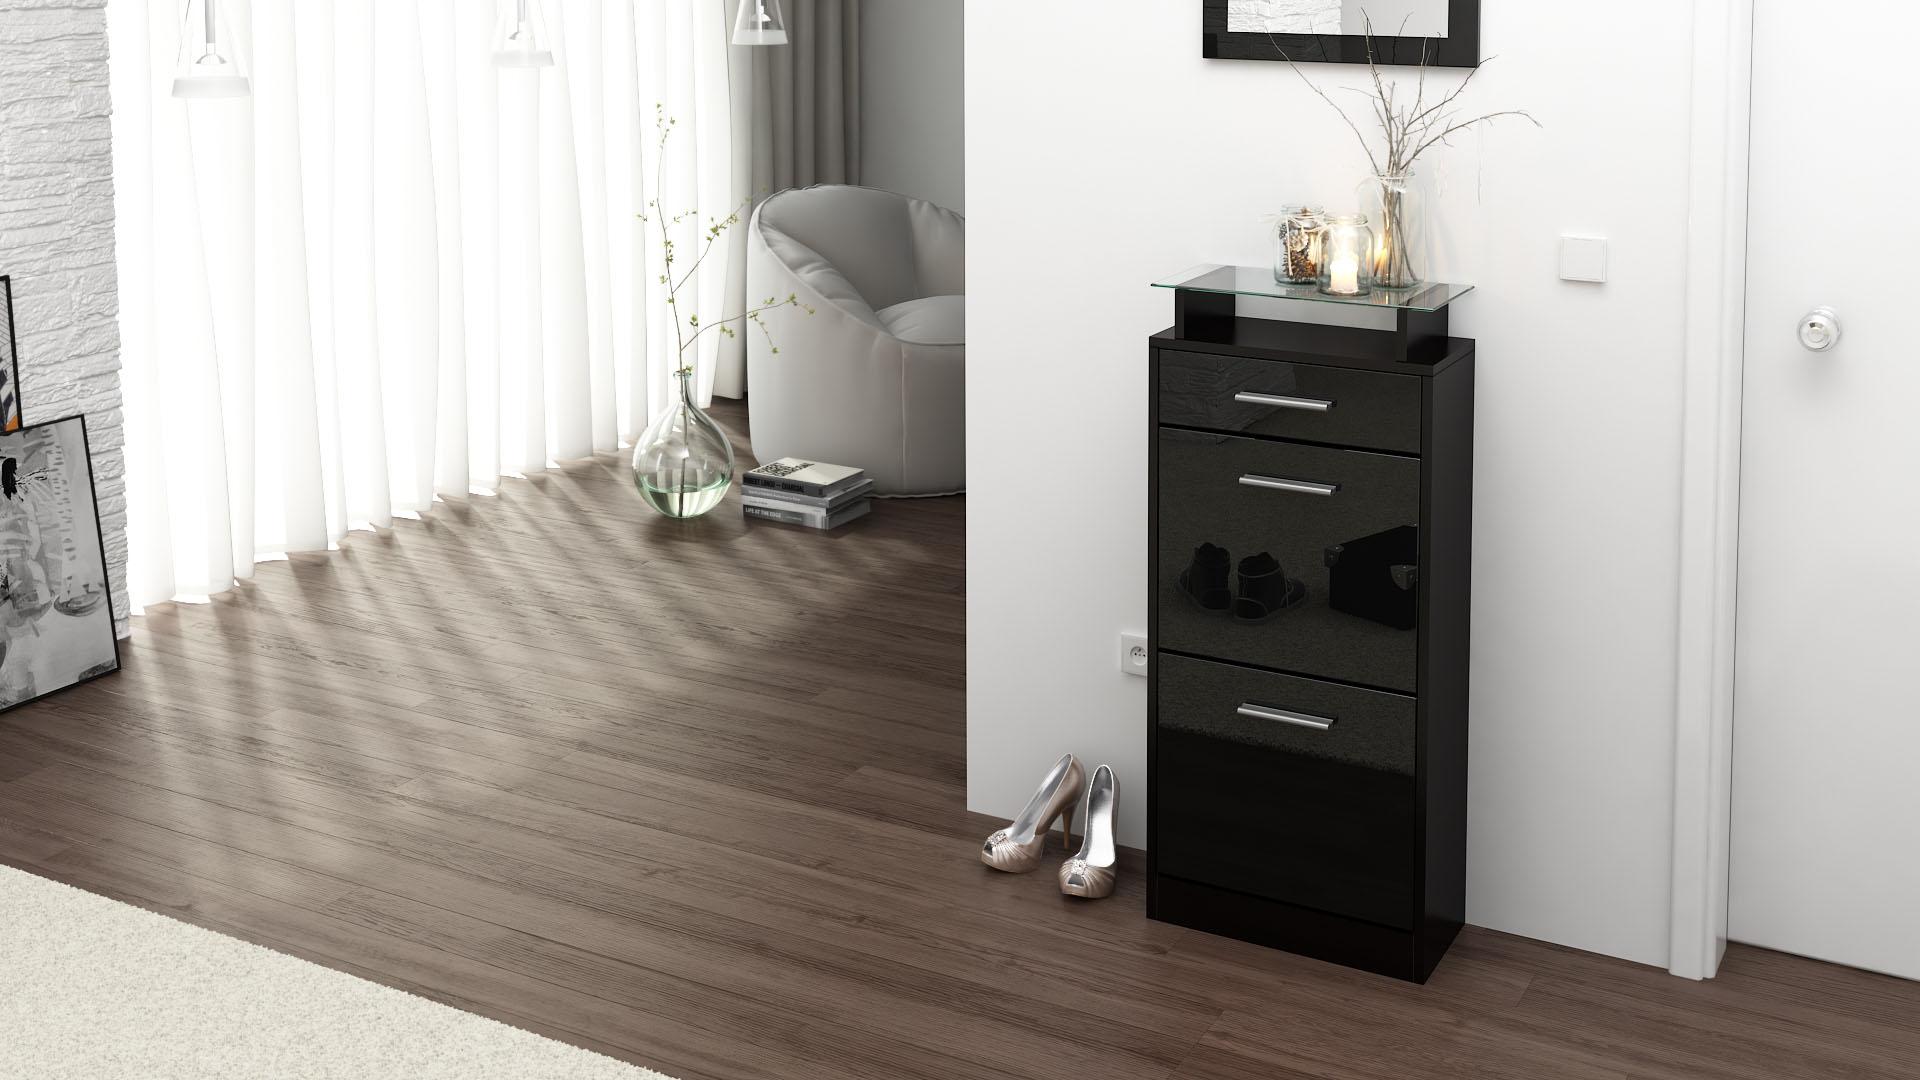 schuhschrank schuhkipper schuh loret v2 in schwarz. Black Bedroom Furniture Sets. Home Design Ideas